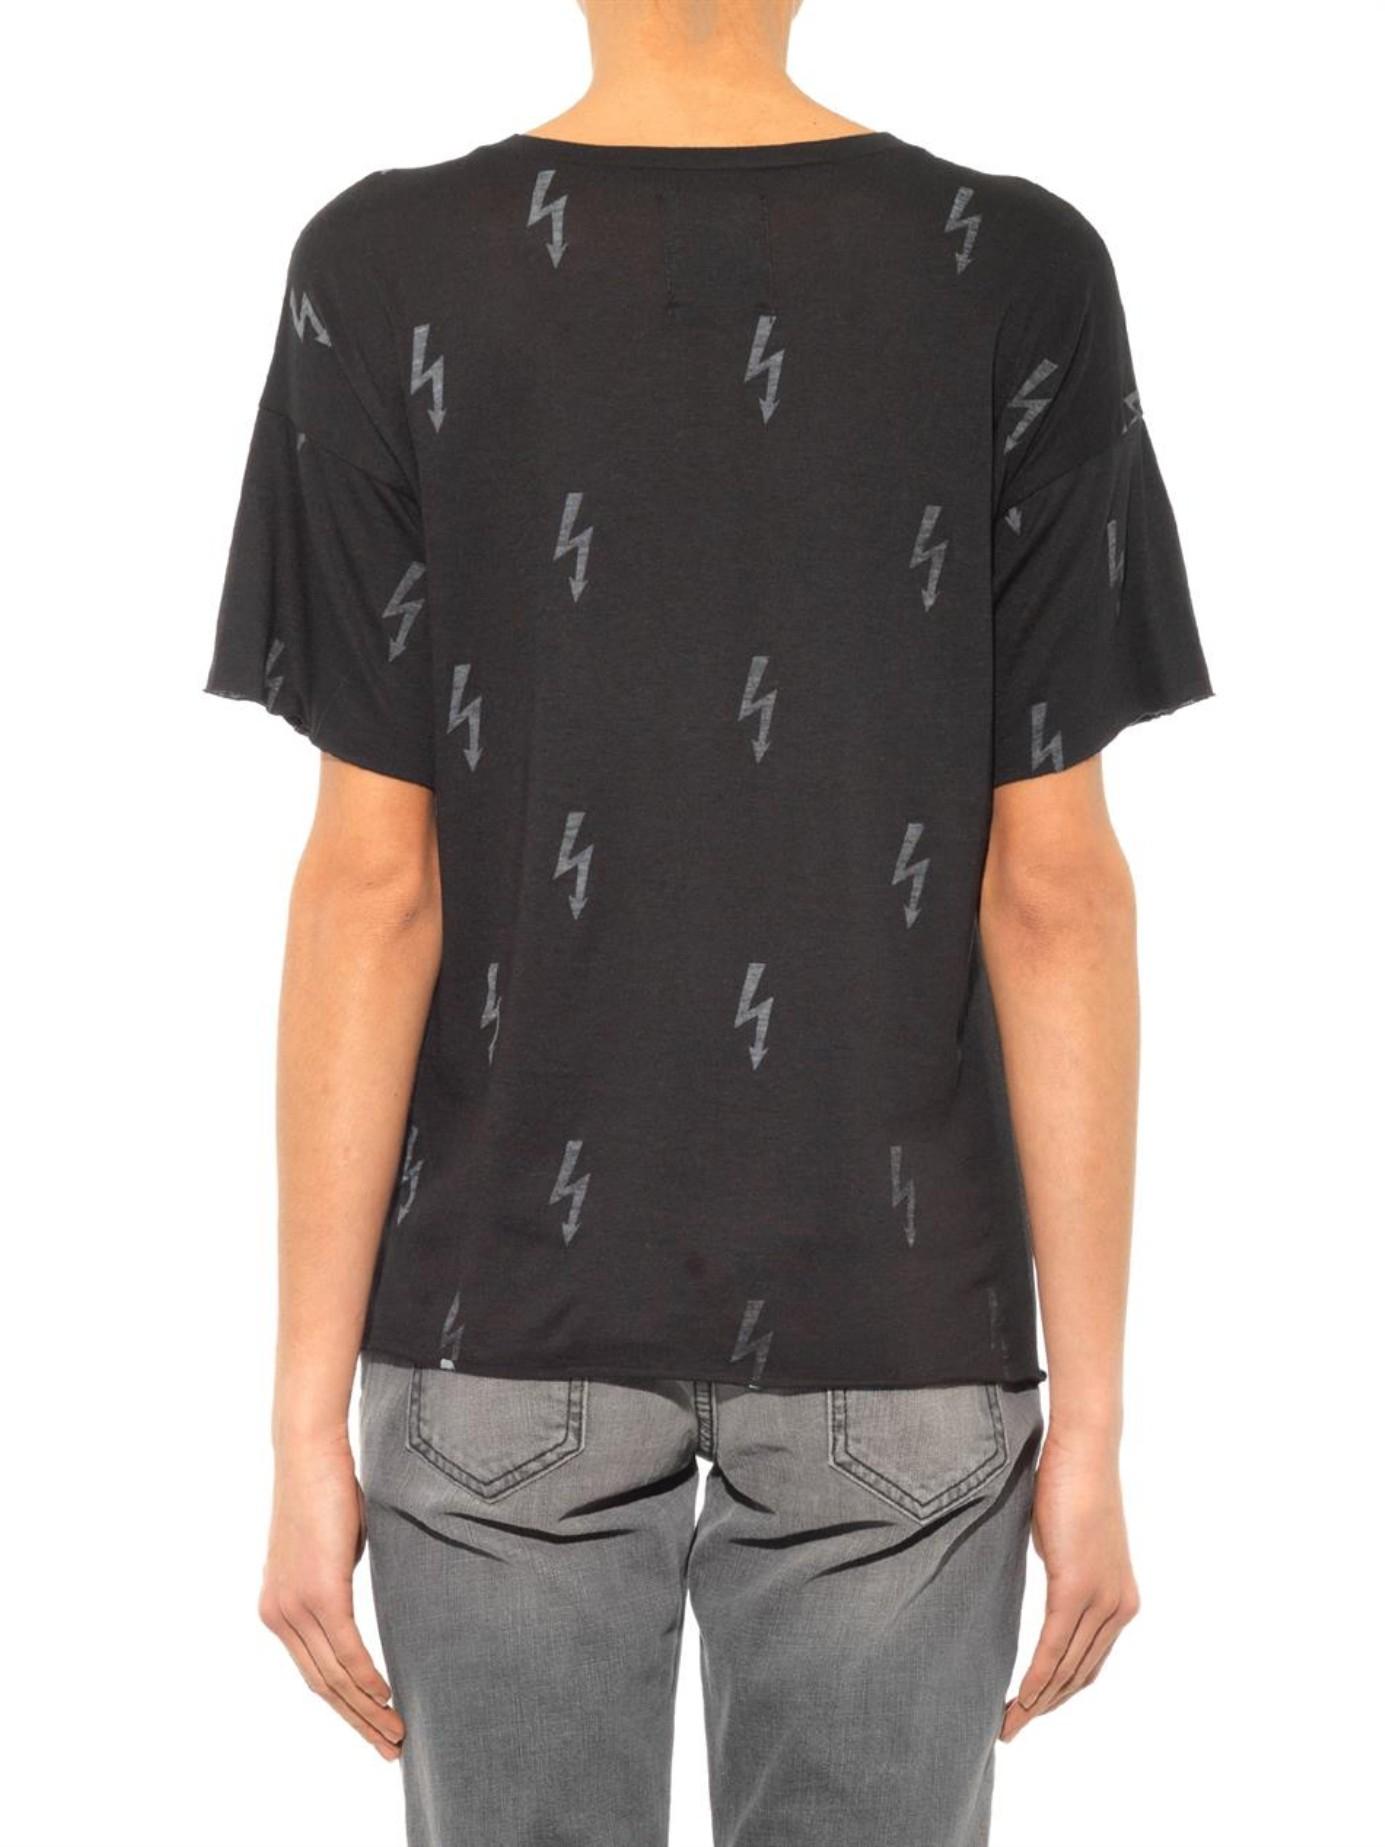 6519d47f1 Zoe Karssen Lightning-Bolt Print T-Shirt in Black - Lyst